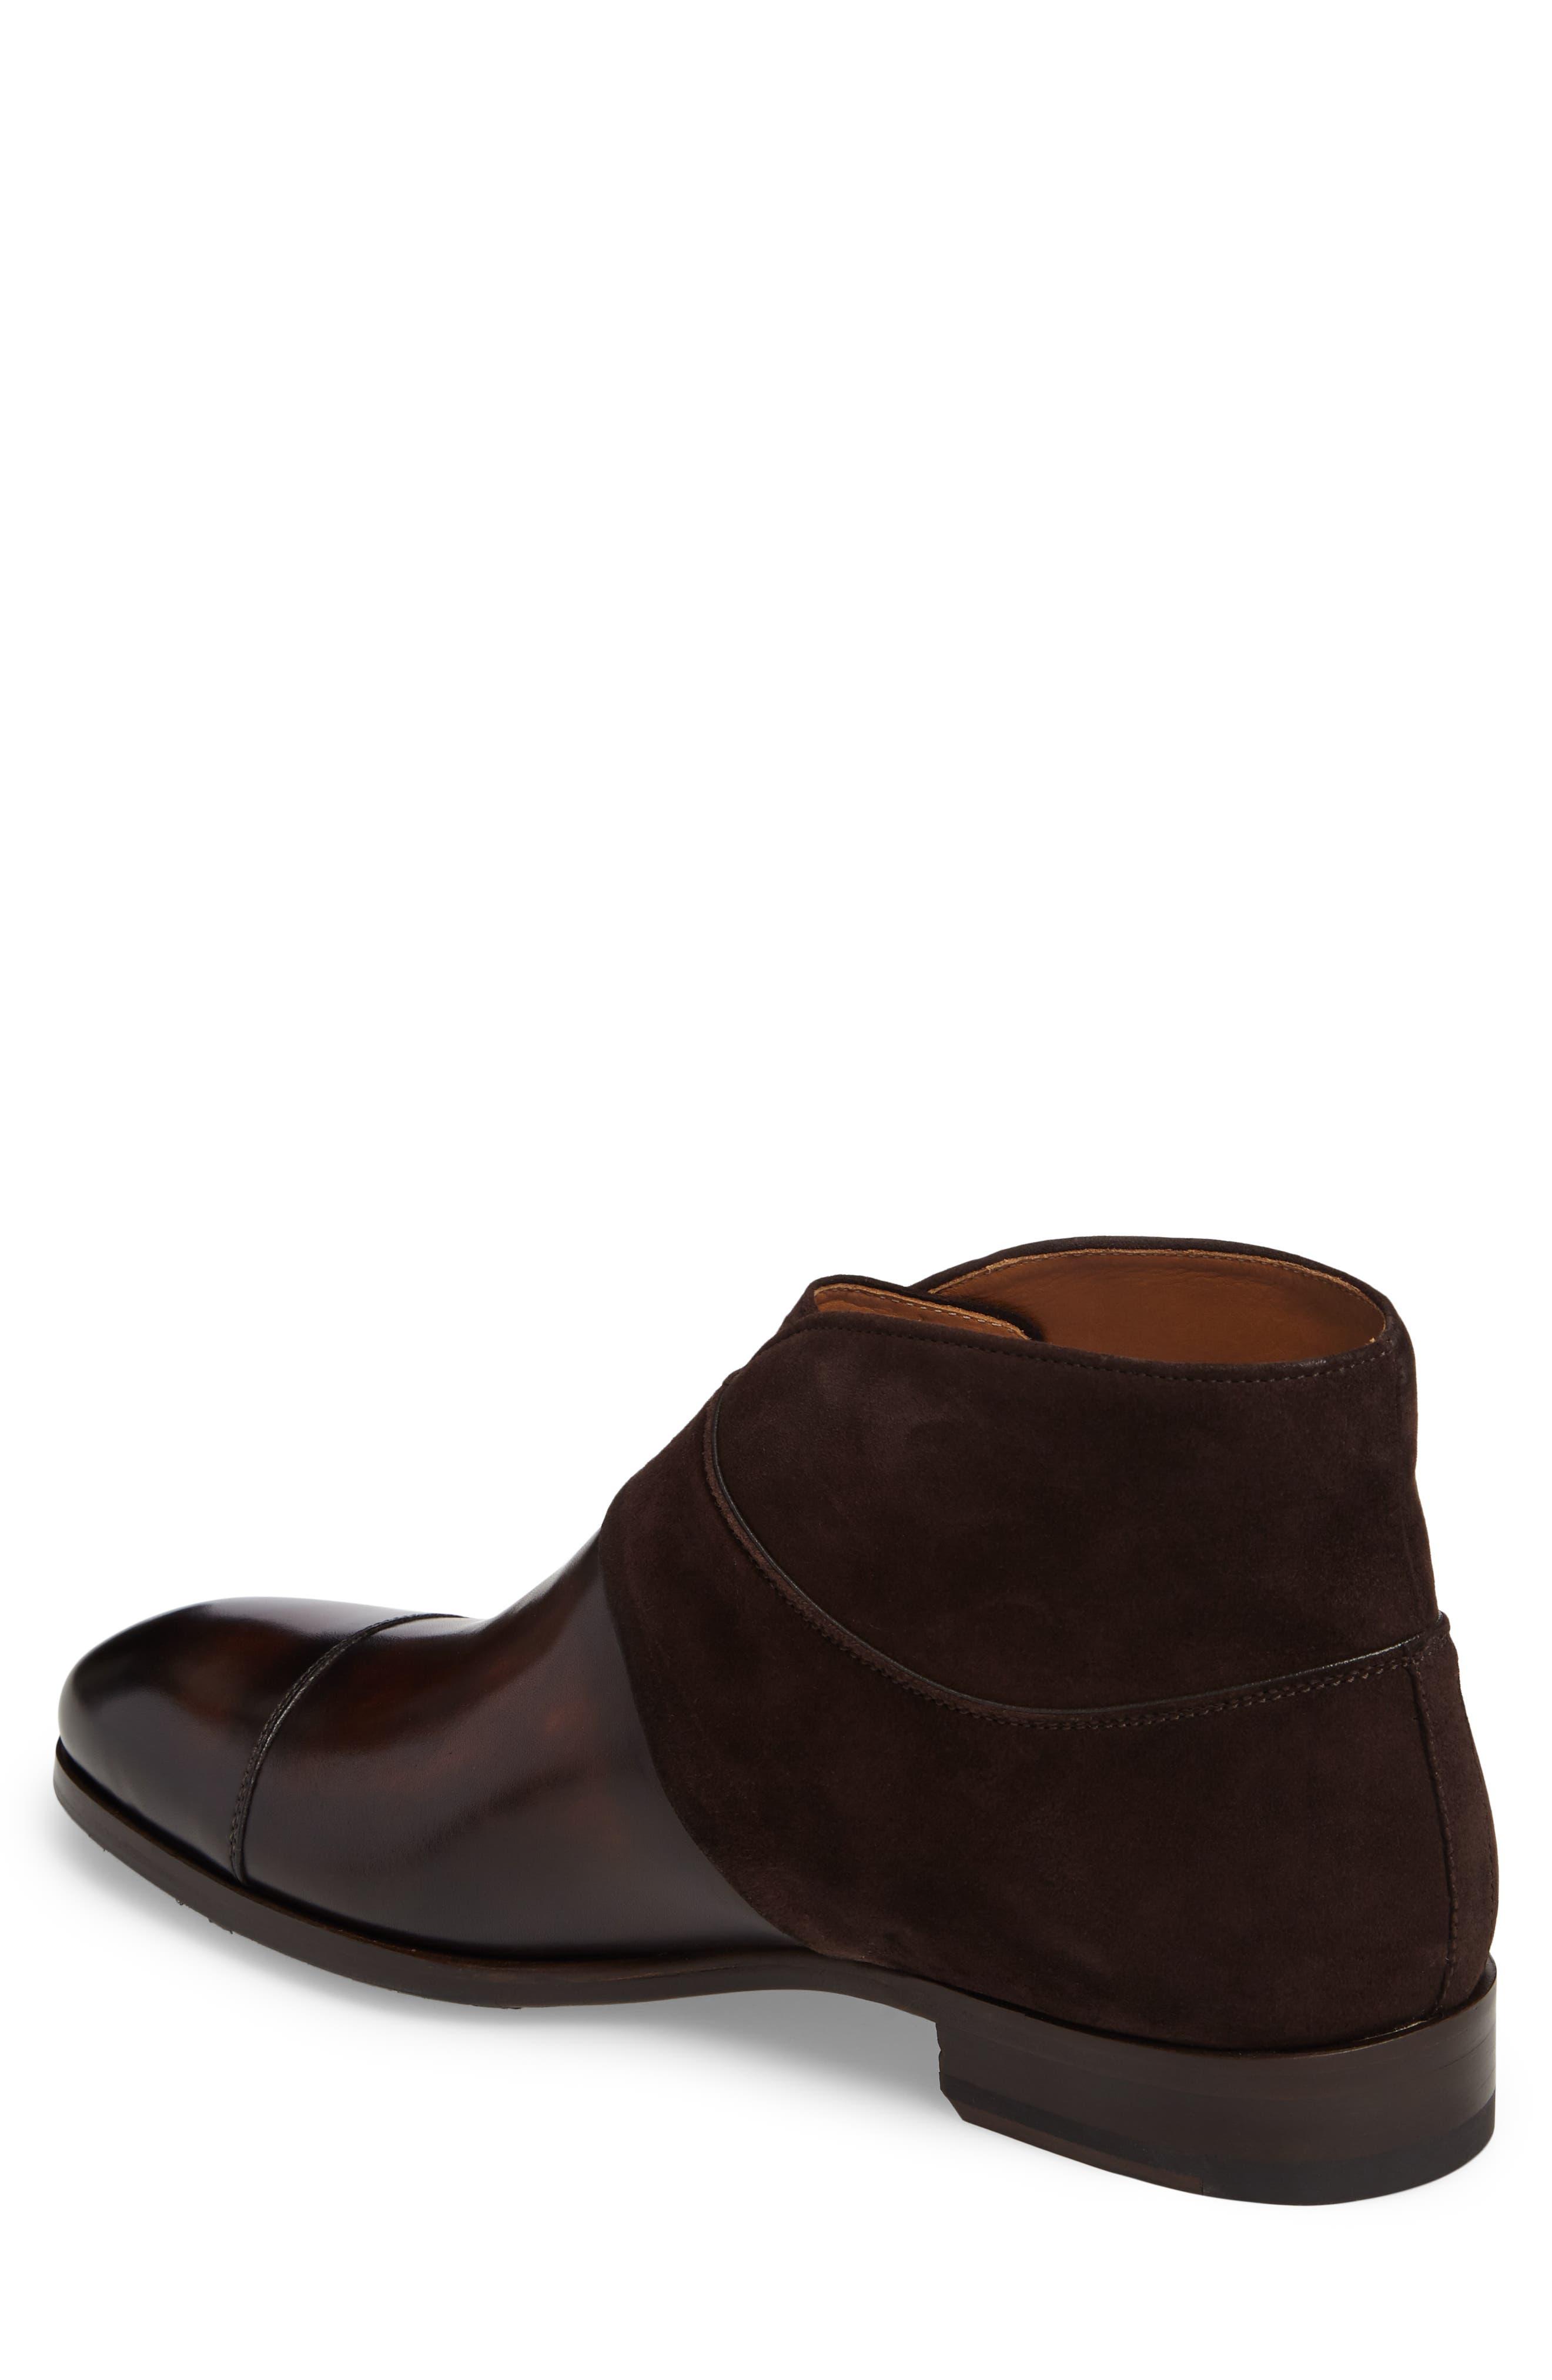 Octavian Double Monk Strap Boot,                             Alternate thumbnail 2, color,                             200